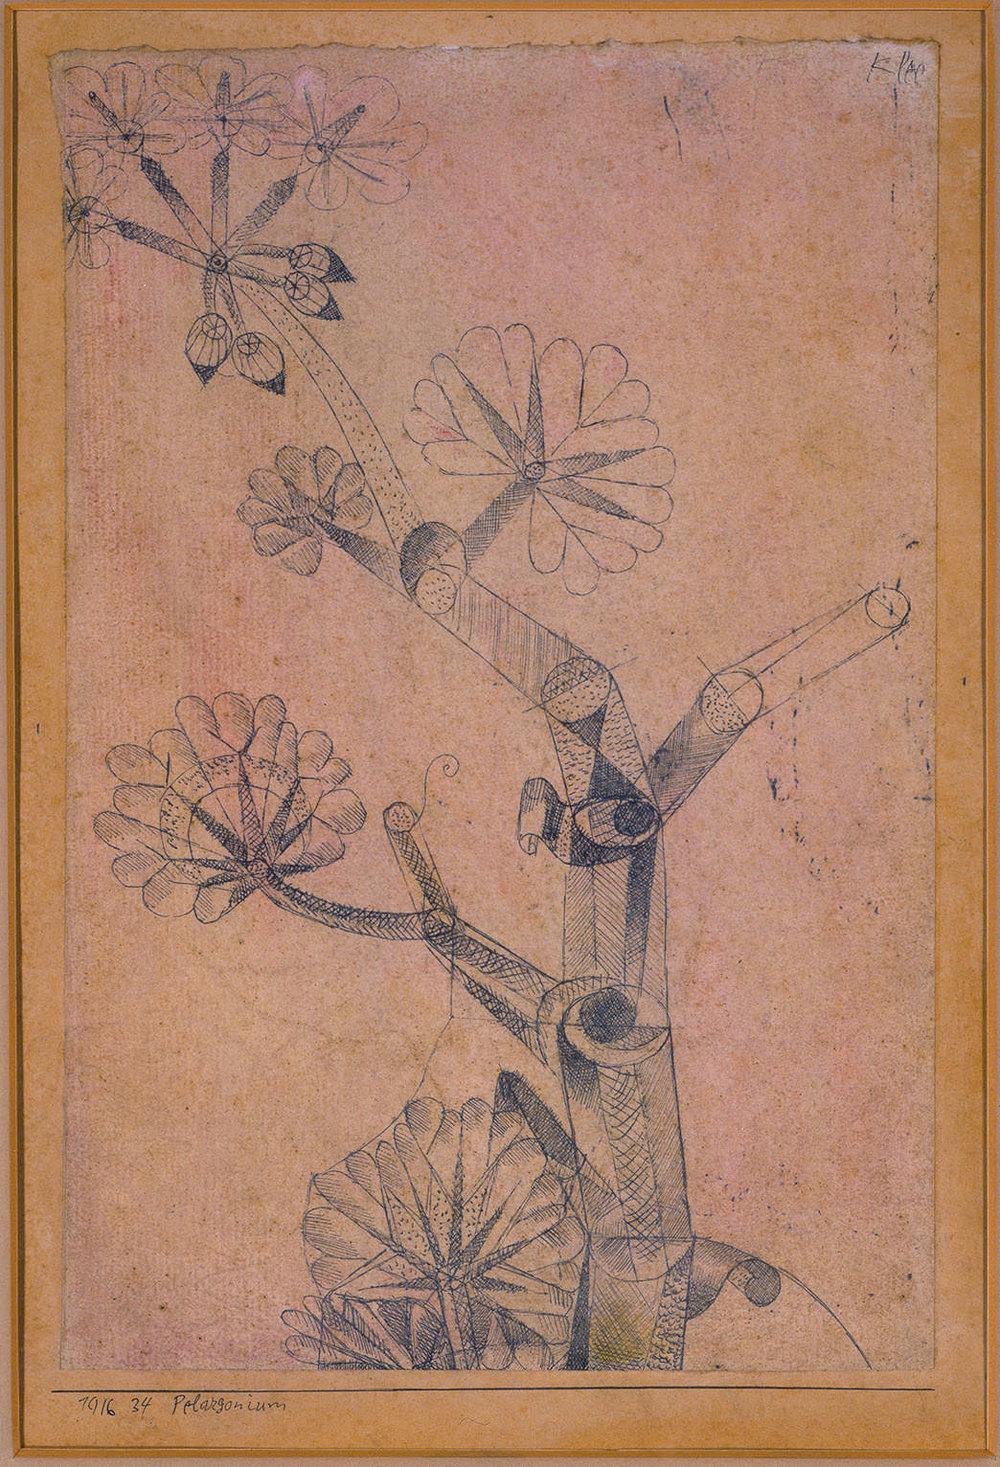 Abb.46 Paul Klee, Pelargonium, 1916, 34 , Feder auf Papier auf Karton , 21,3 x 14 cm , Privatsammlung, Courtesy Galerie Pangée © Zentrum Paul Klee, Bern, Archiv